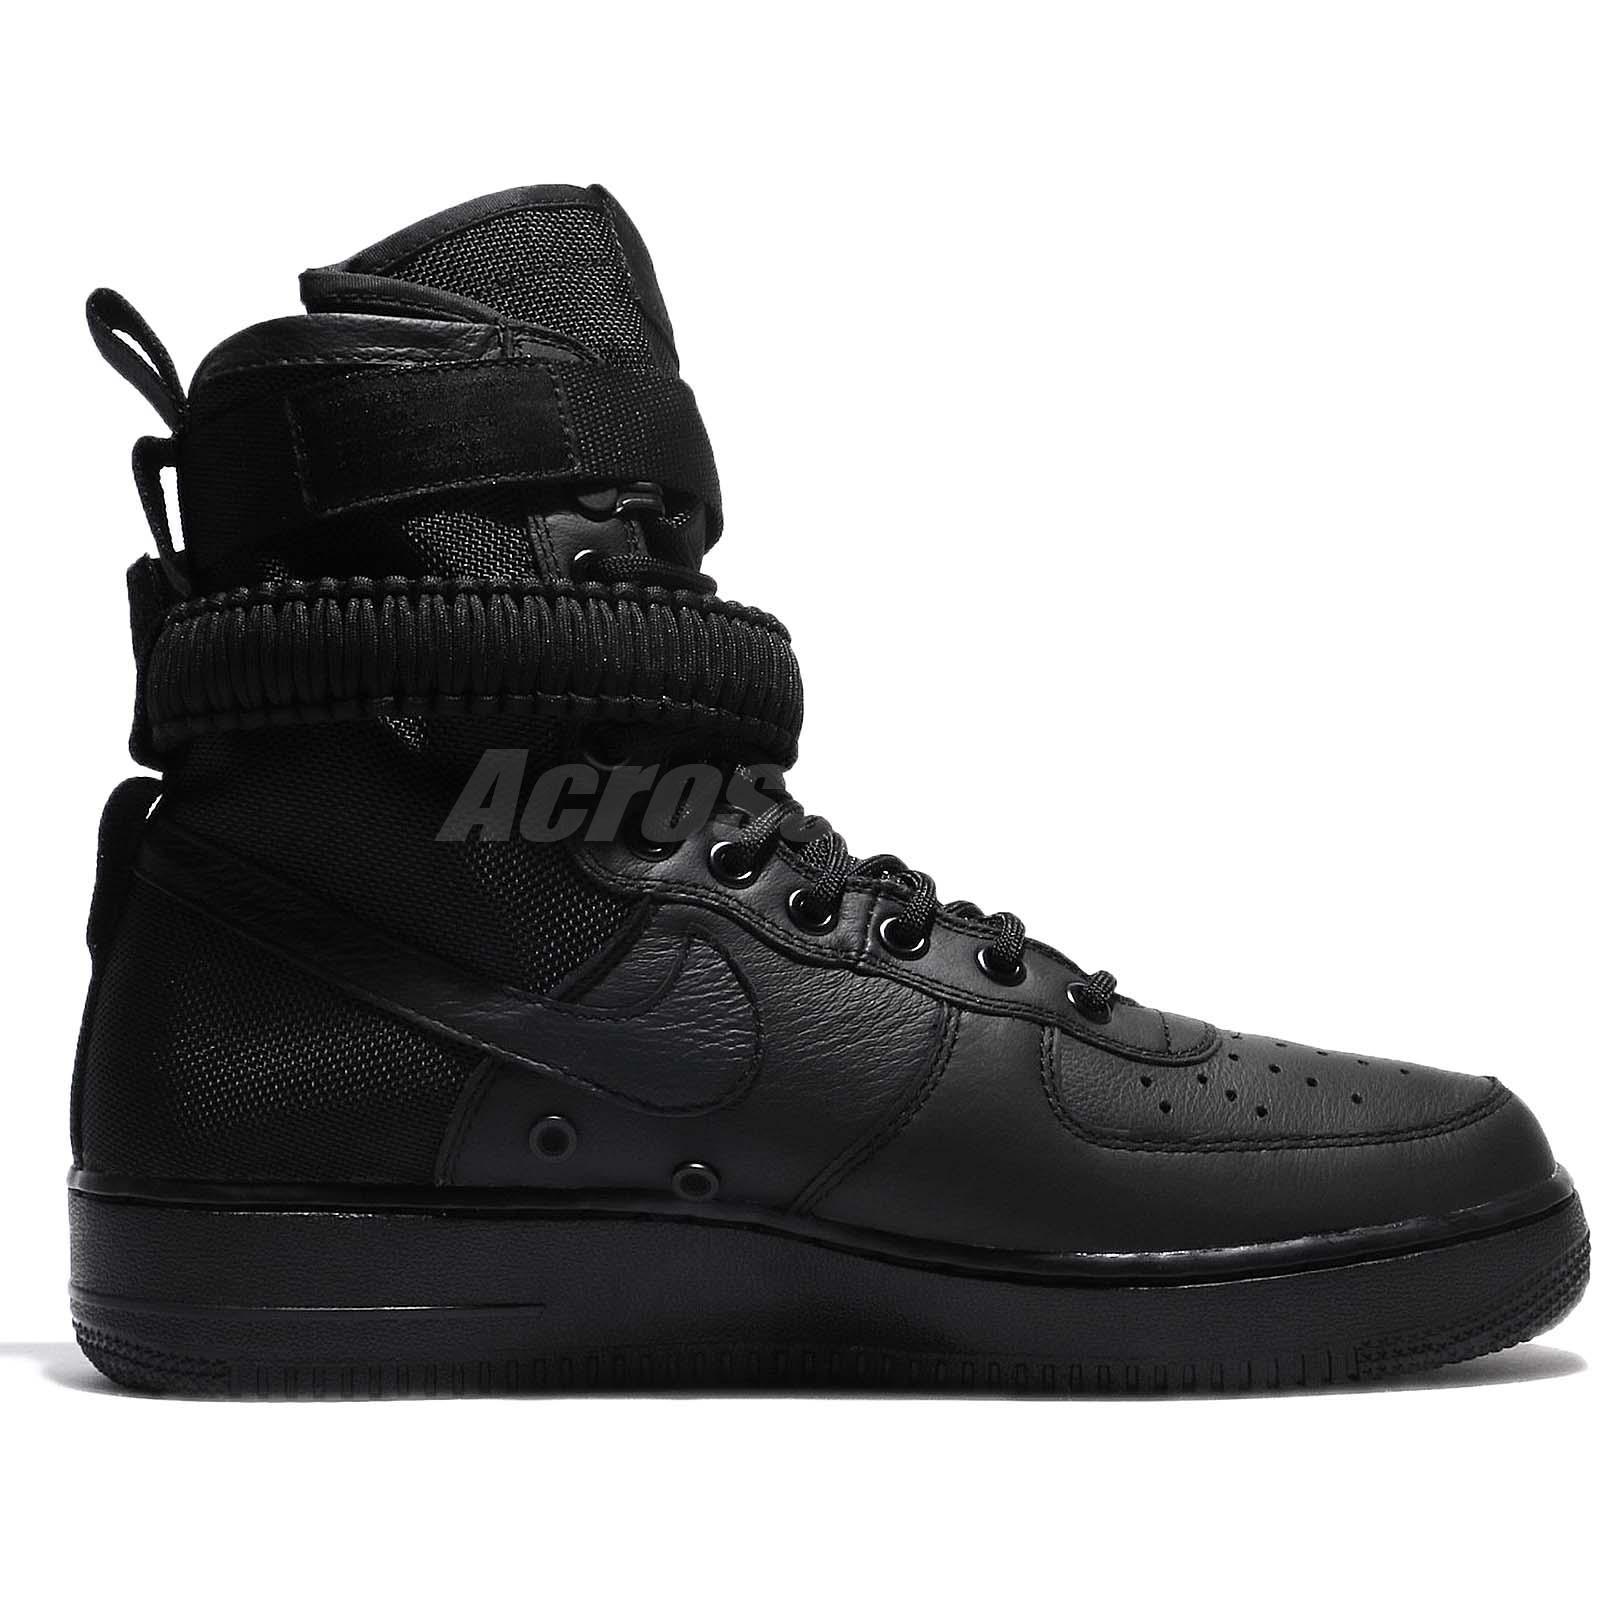 special field air force 1 triple black nz